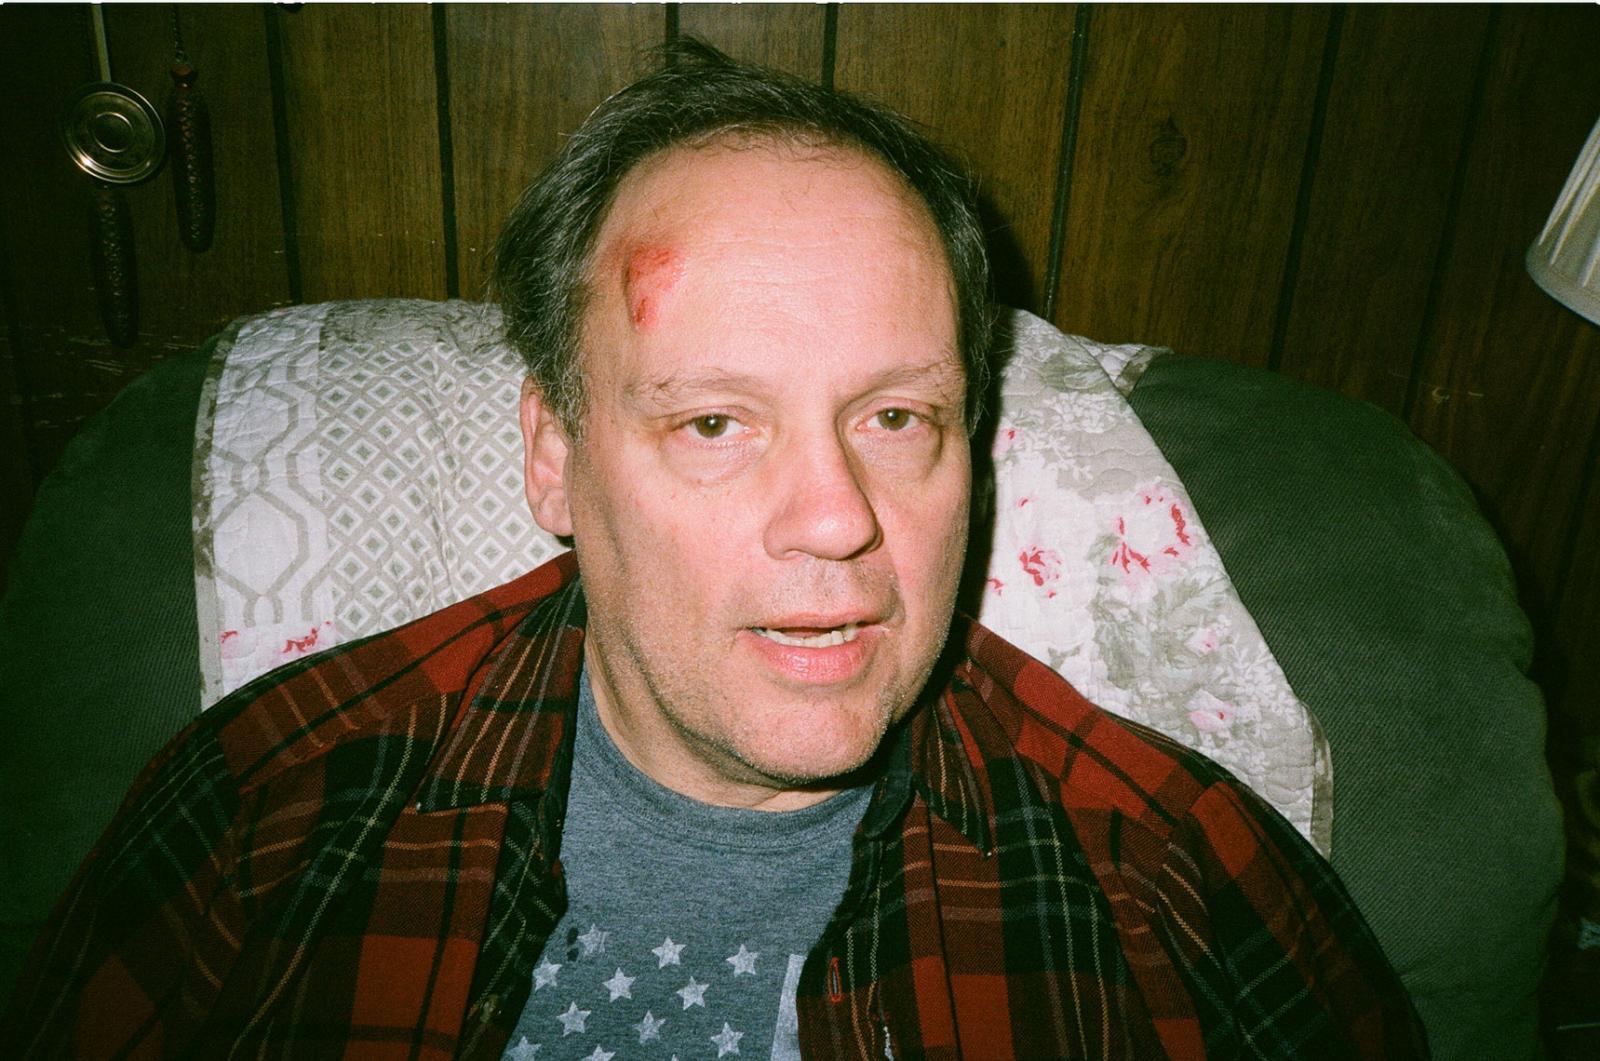 Injured, Christmas Eve, 2019